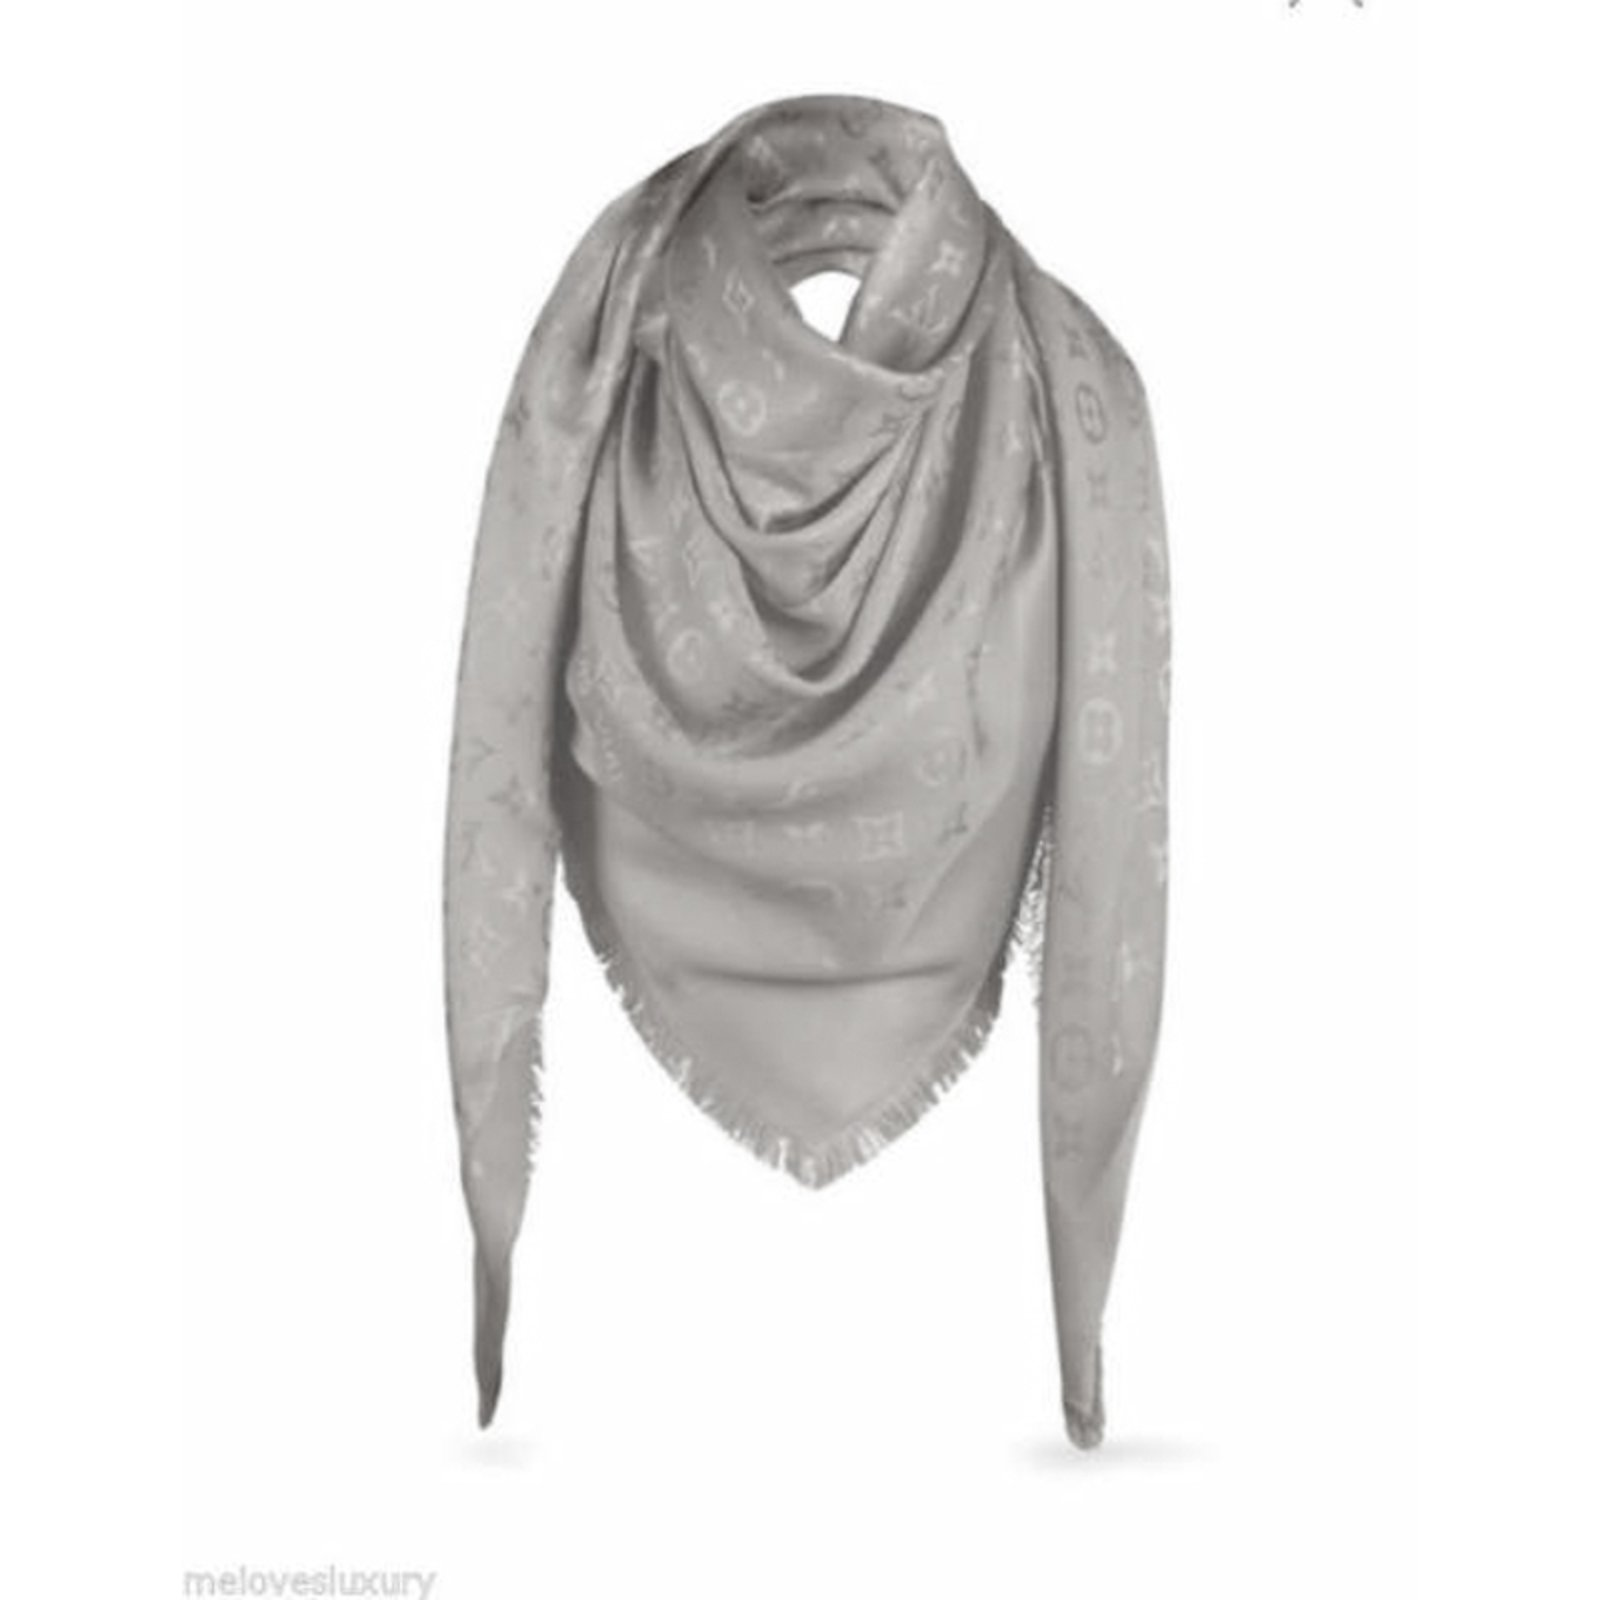 e7b0a457cb12 Louis Vuitton Classical Monogram Scarf Scarves Silk Beige ref.51158 ...